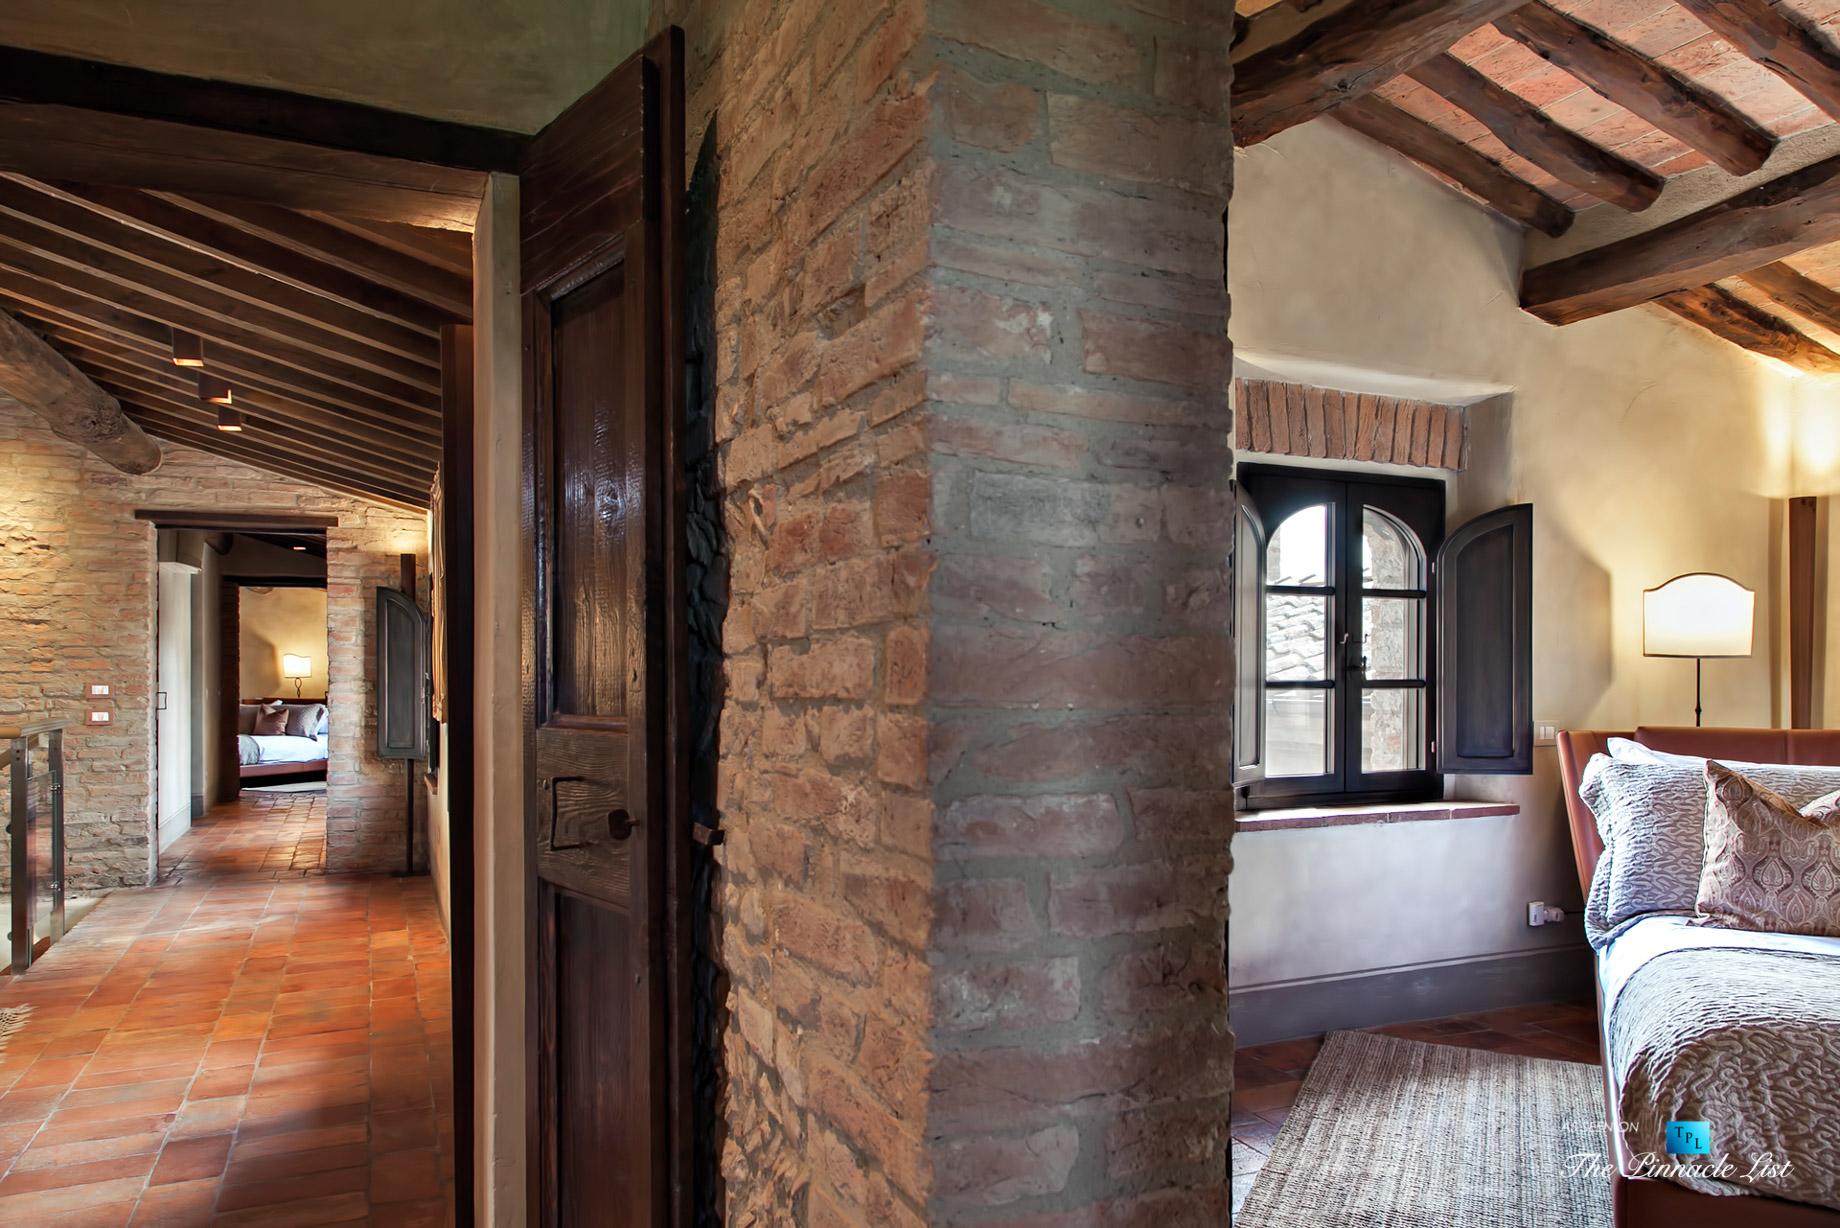 Podere Paníco Estate - Monteroni d'Arbia, Tuscany, Italy - Hallway and Bedroom - Luxury Real Estate - Tuscan Villa